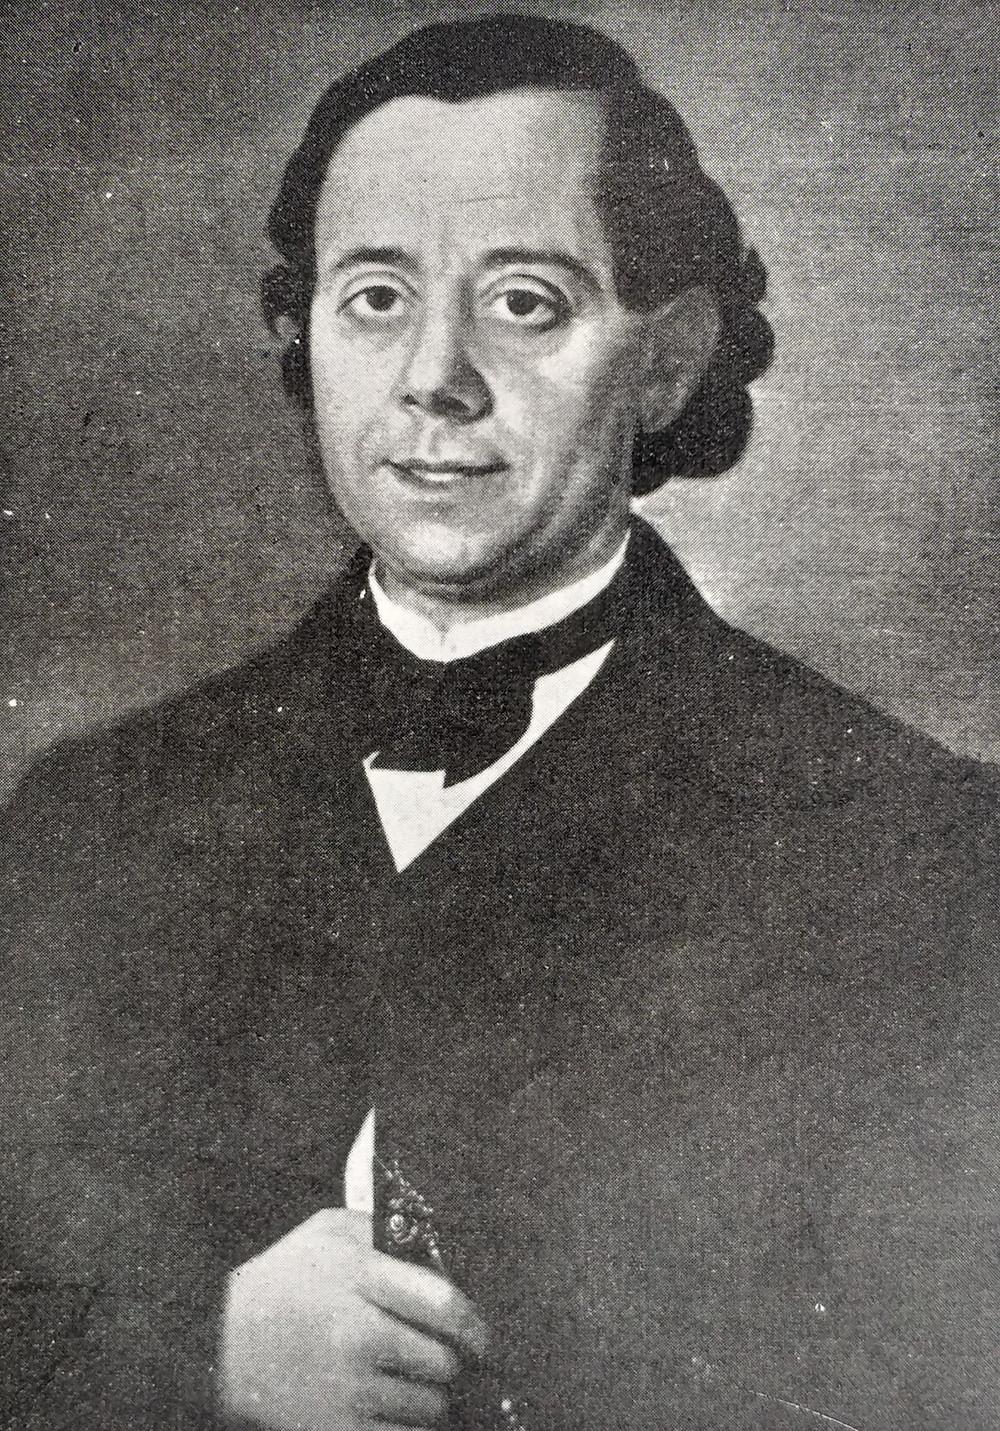 Antonio Petito